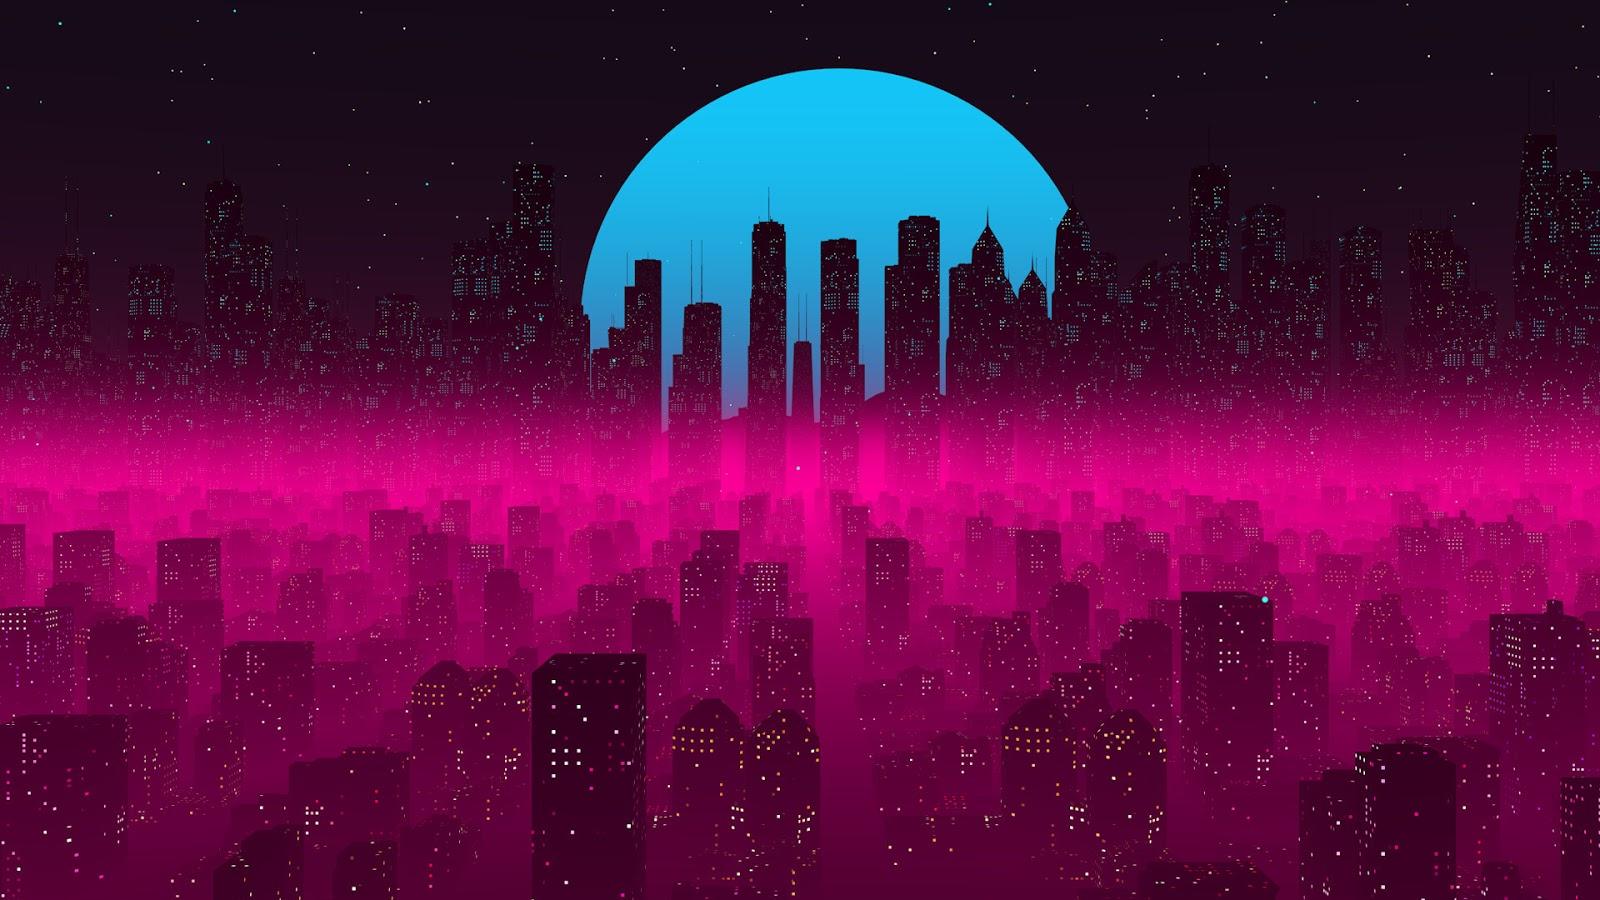 Cyberpunk City Wallpaper 4k Heroscreen Cool Wallpapers